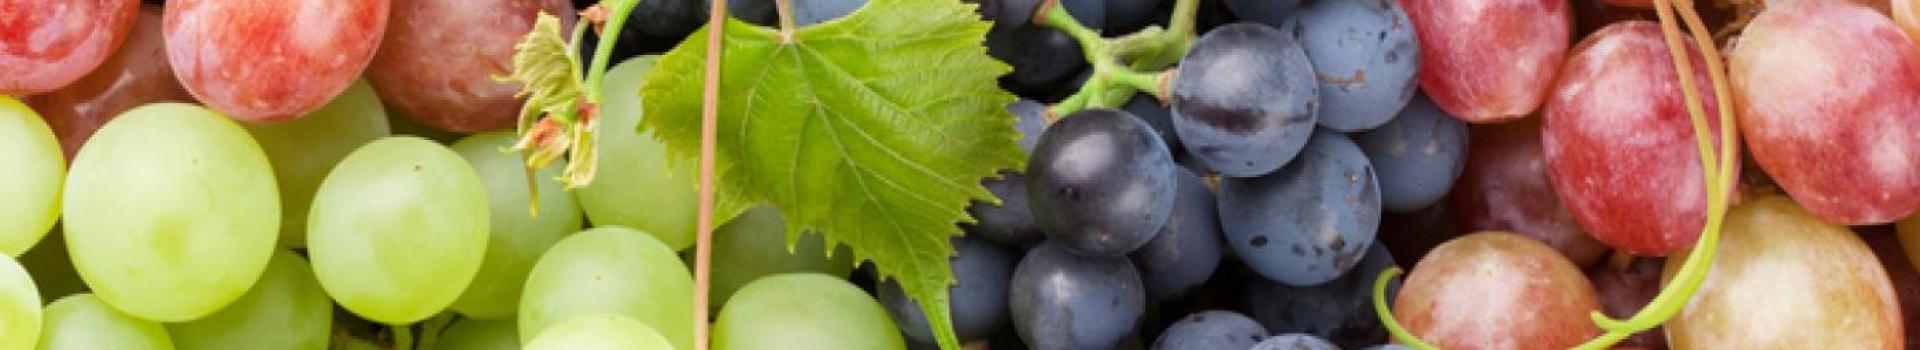 کاشت نهال انگور